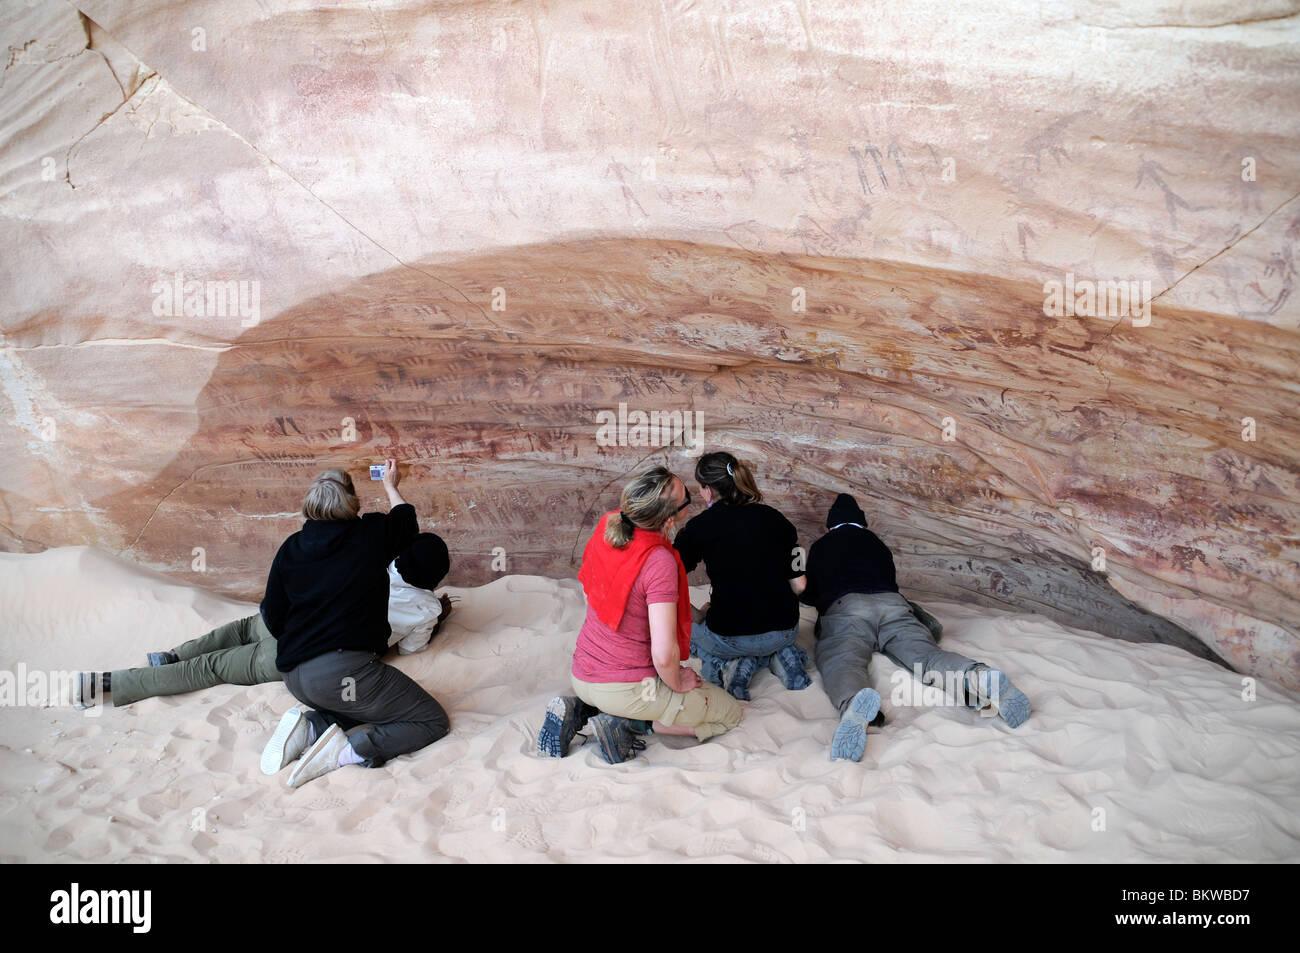 Travelers examining rock art at Mestekawi Cave, in the Gilf Kebir region of Egypt's Western Desert. - Stock Image